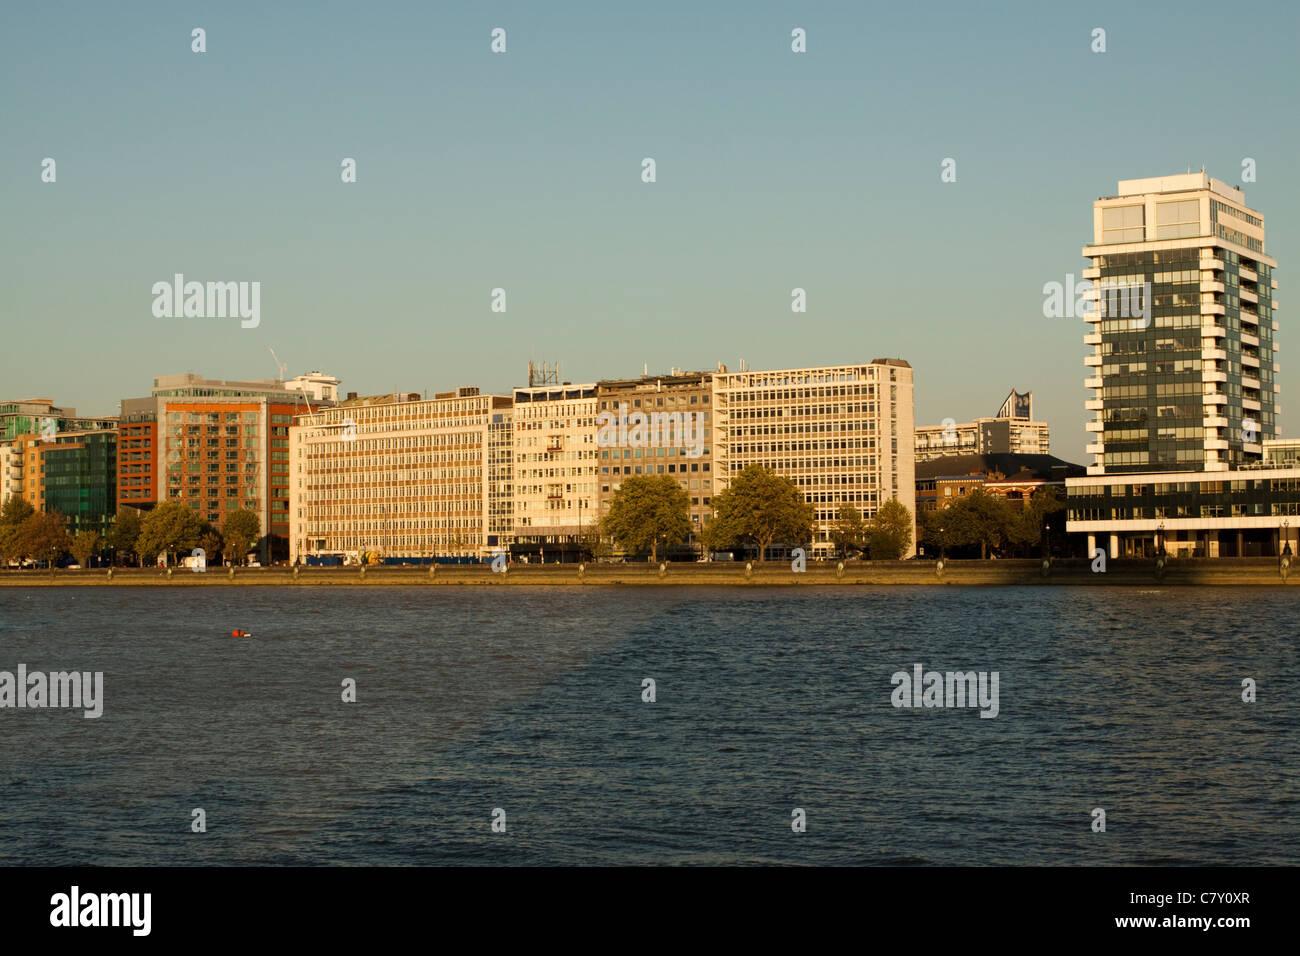 Albert Embankment, London, England, UK - Stock Image